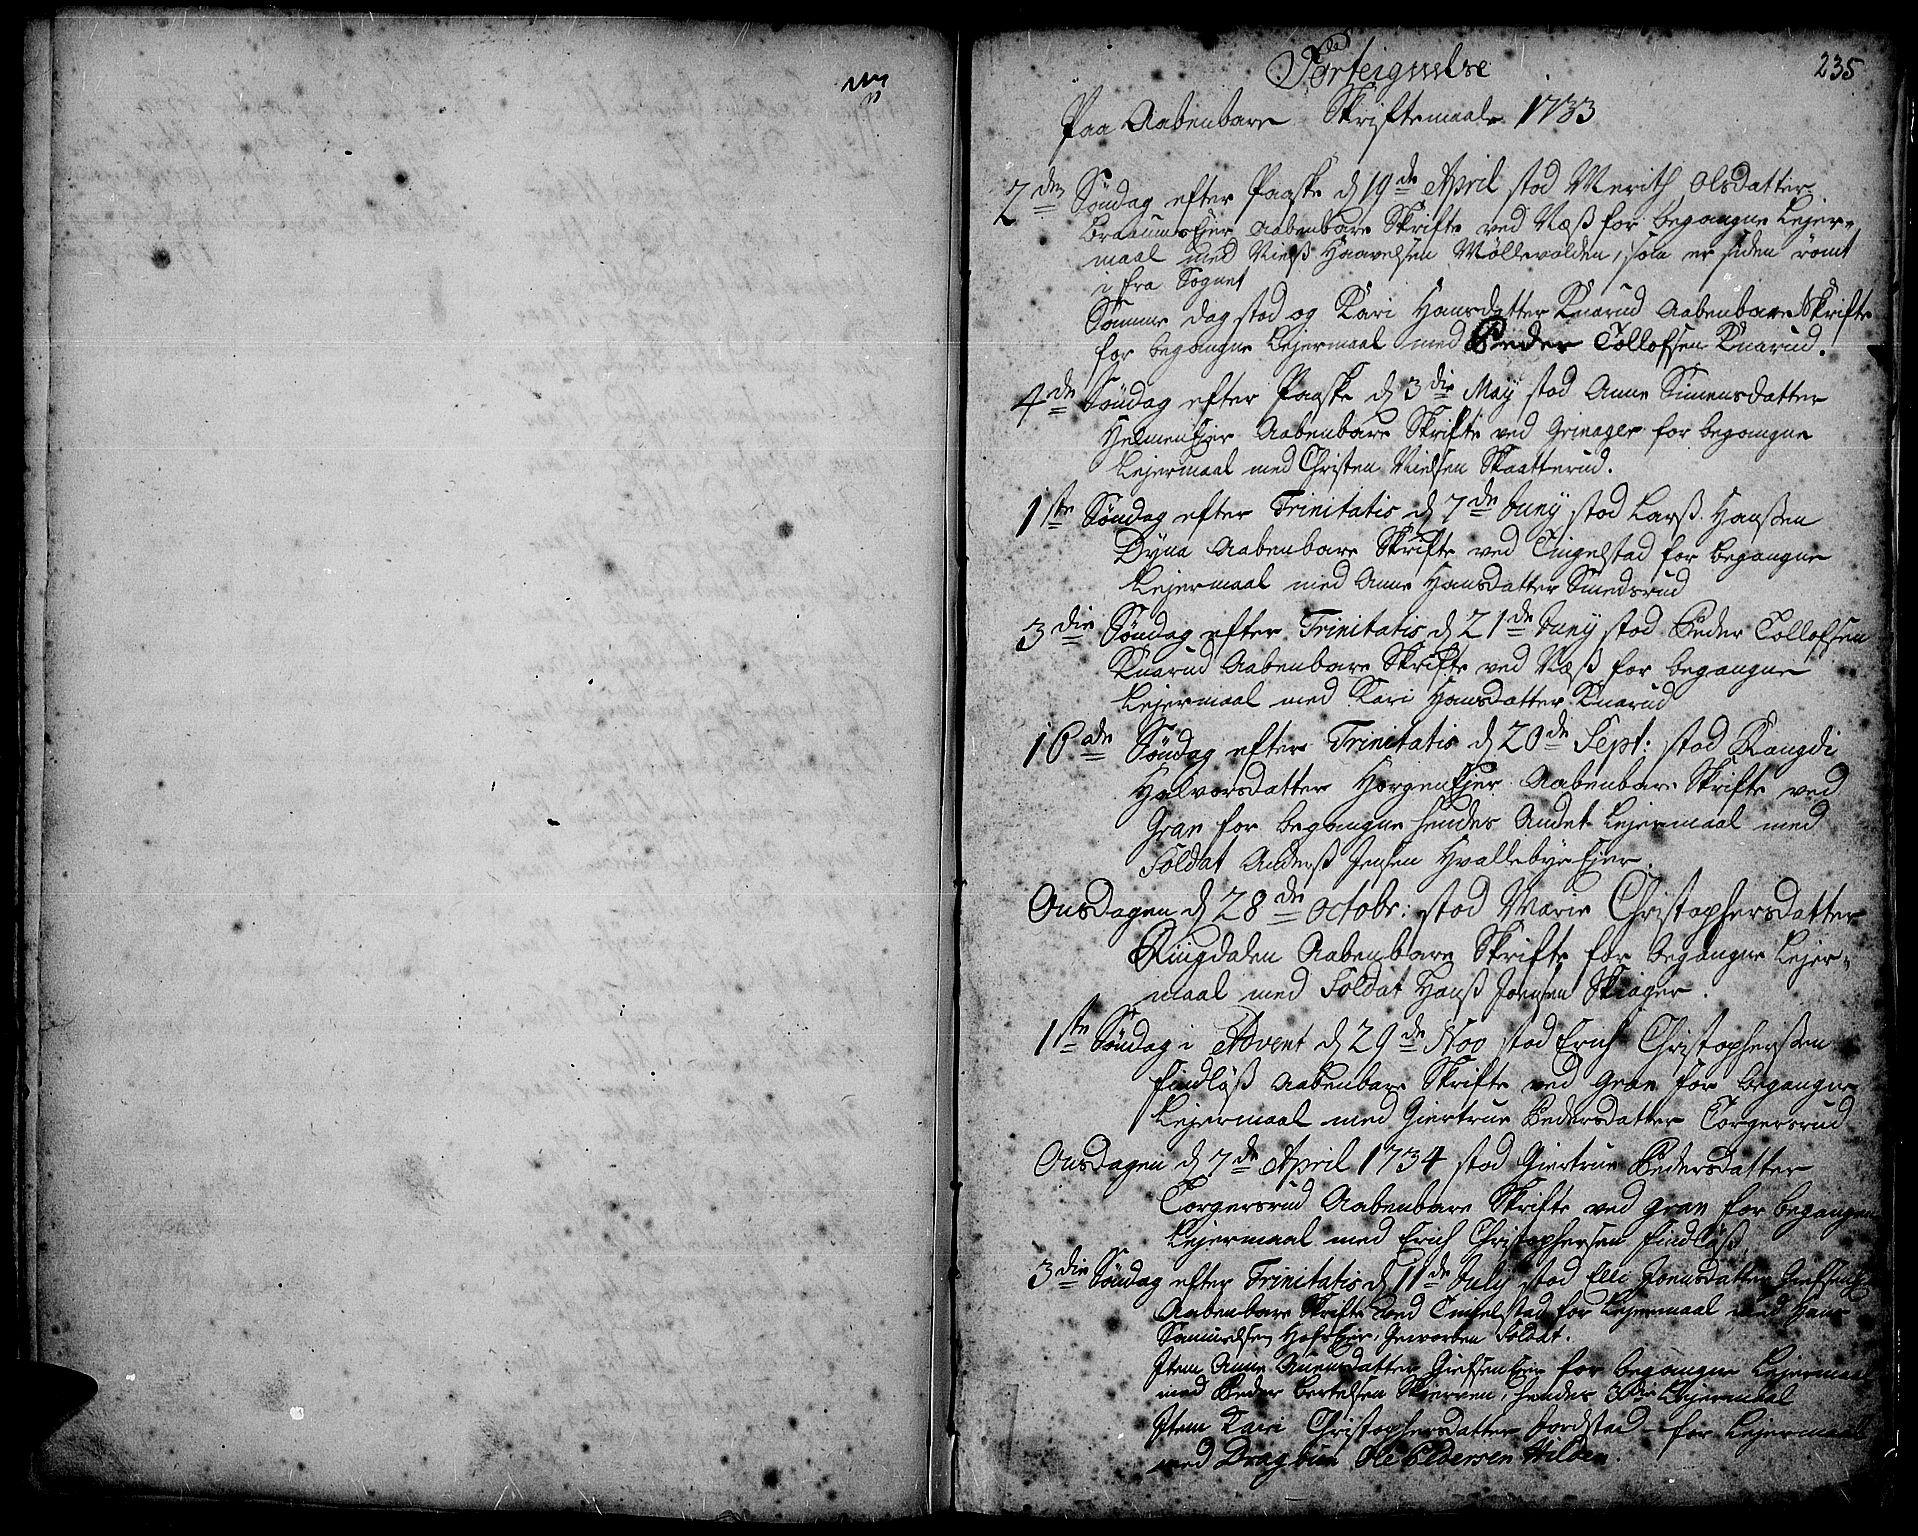 SAH, Gran prestekontor, Ministerialbok nr. 2, 1732-1744, s. 235